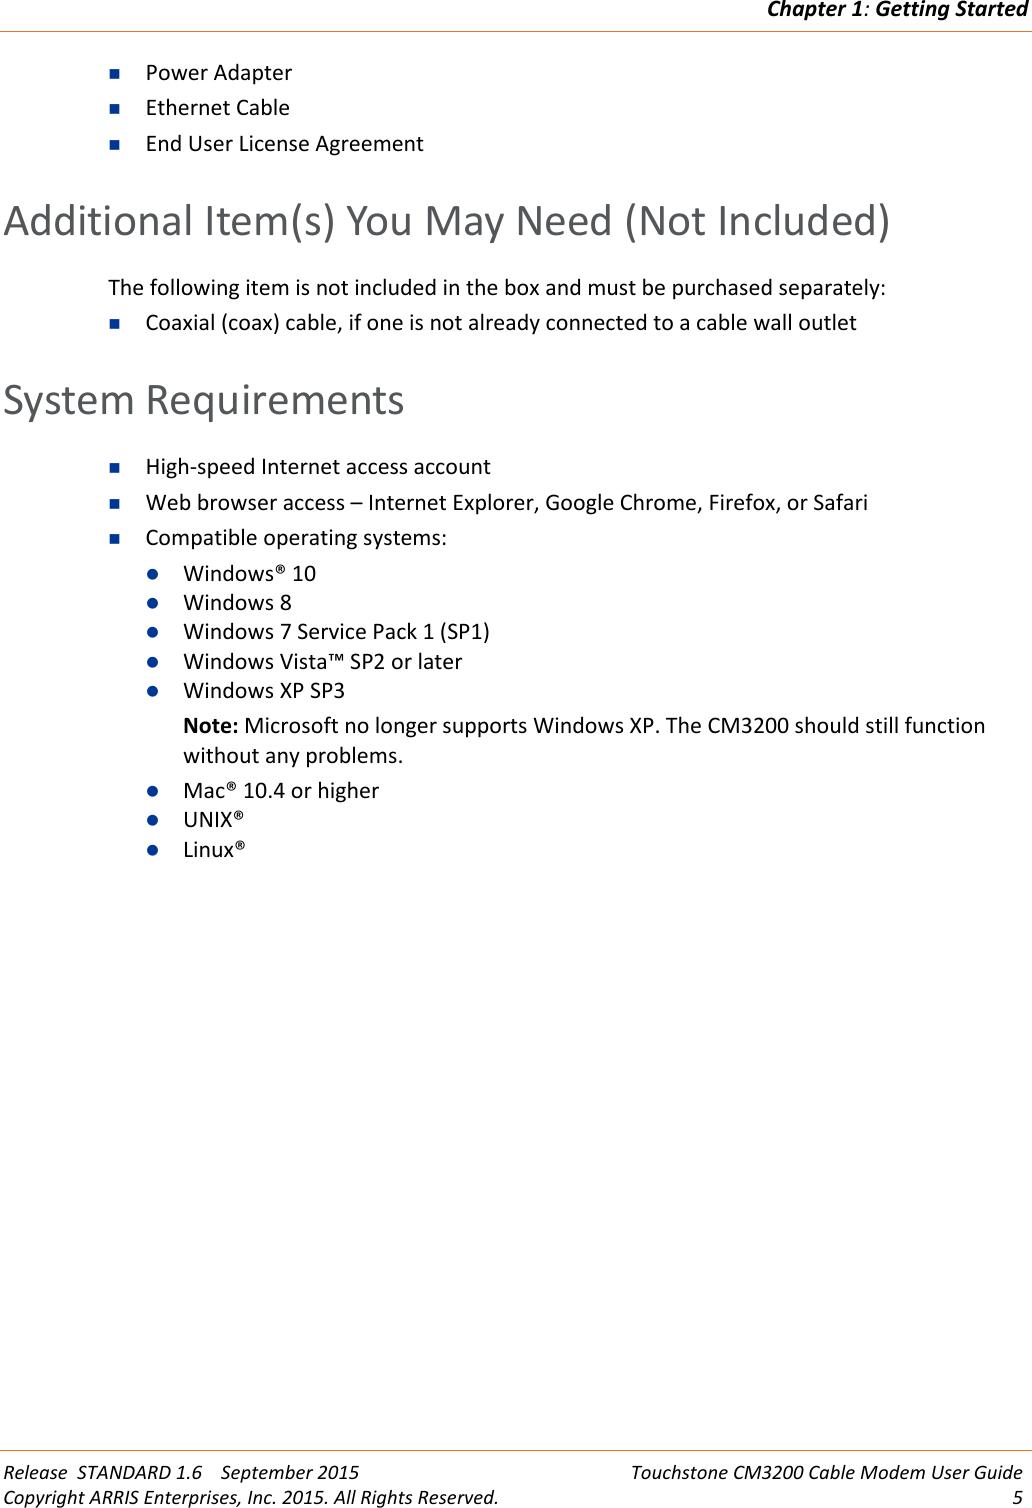 Arris CM3200 User Manual CM3200: Guide Cable Modem